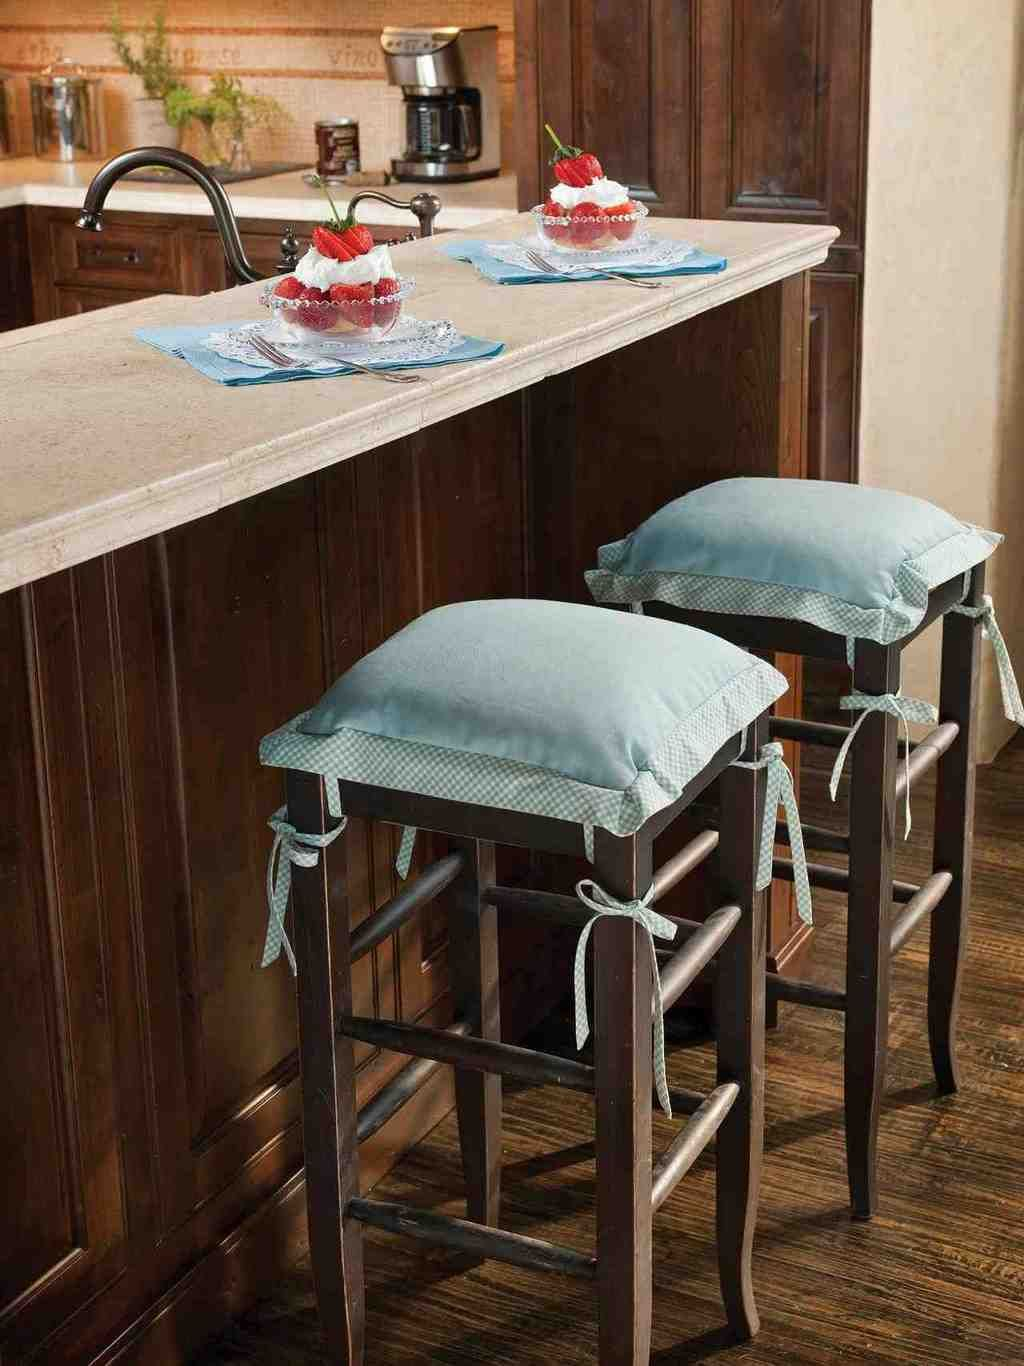 Peachy Bar Stool Cushions Bar Stool Cushions Kitchen Seating Theyellowbook Wood Chair Design Ideas Theyellowbookinfo